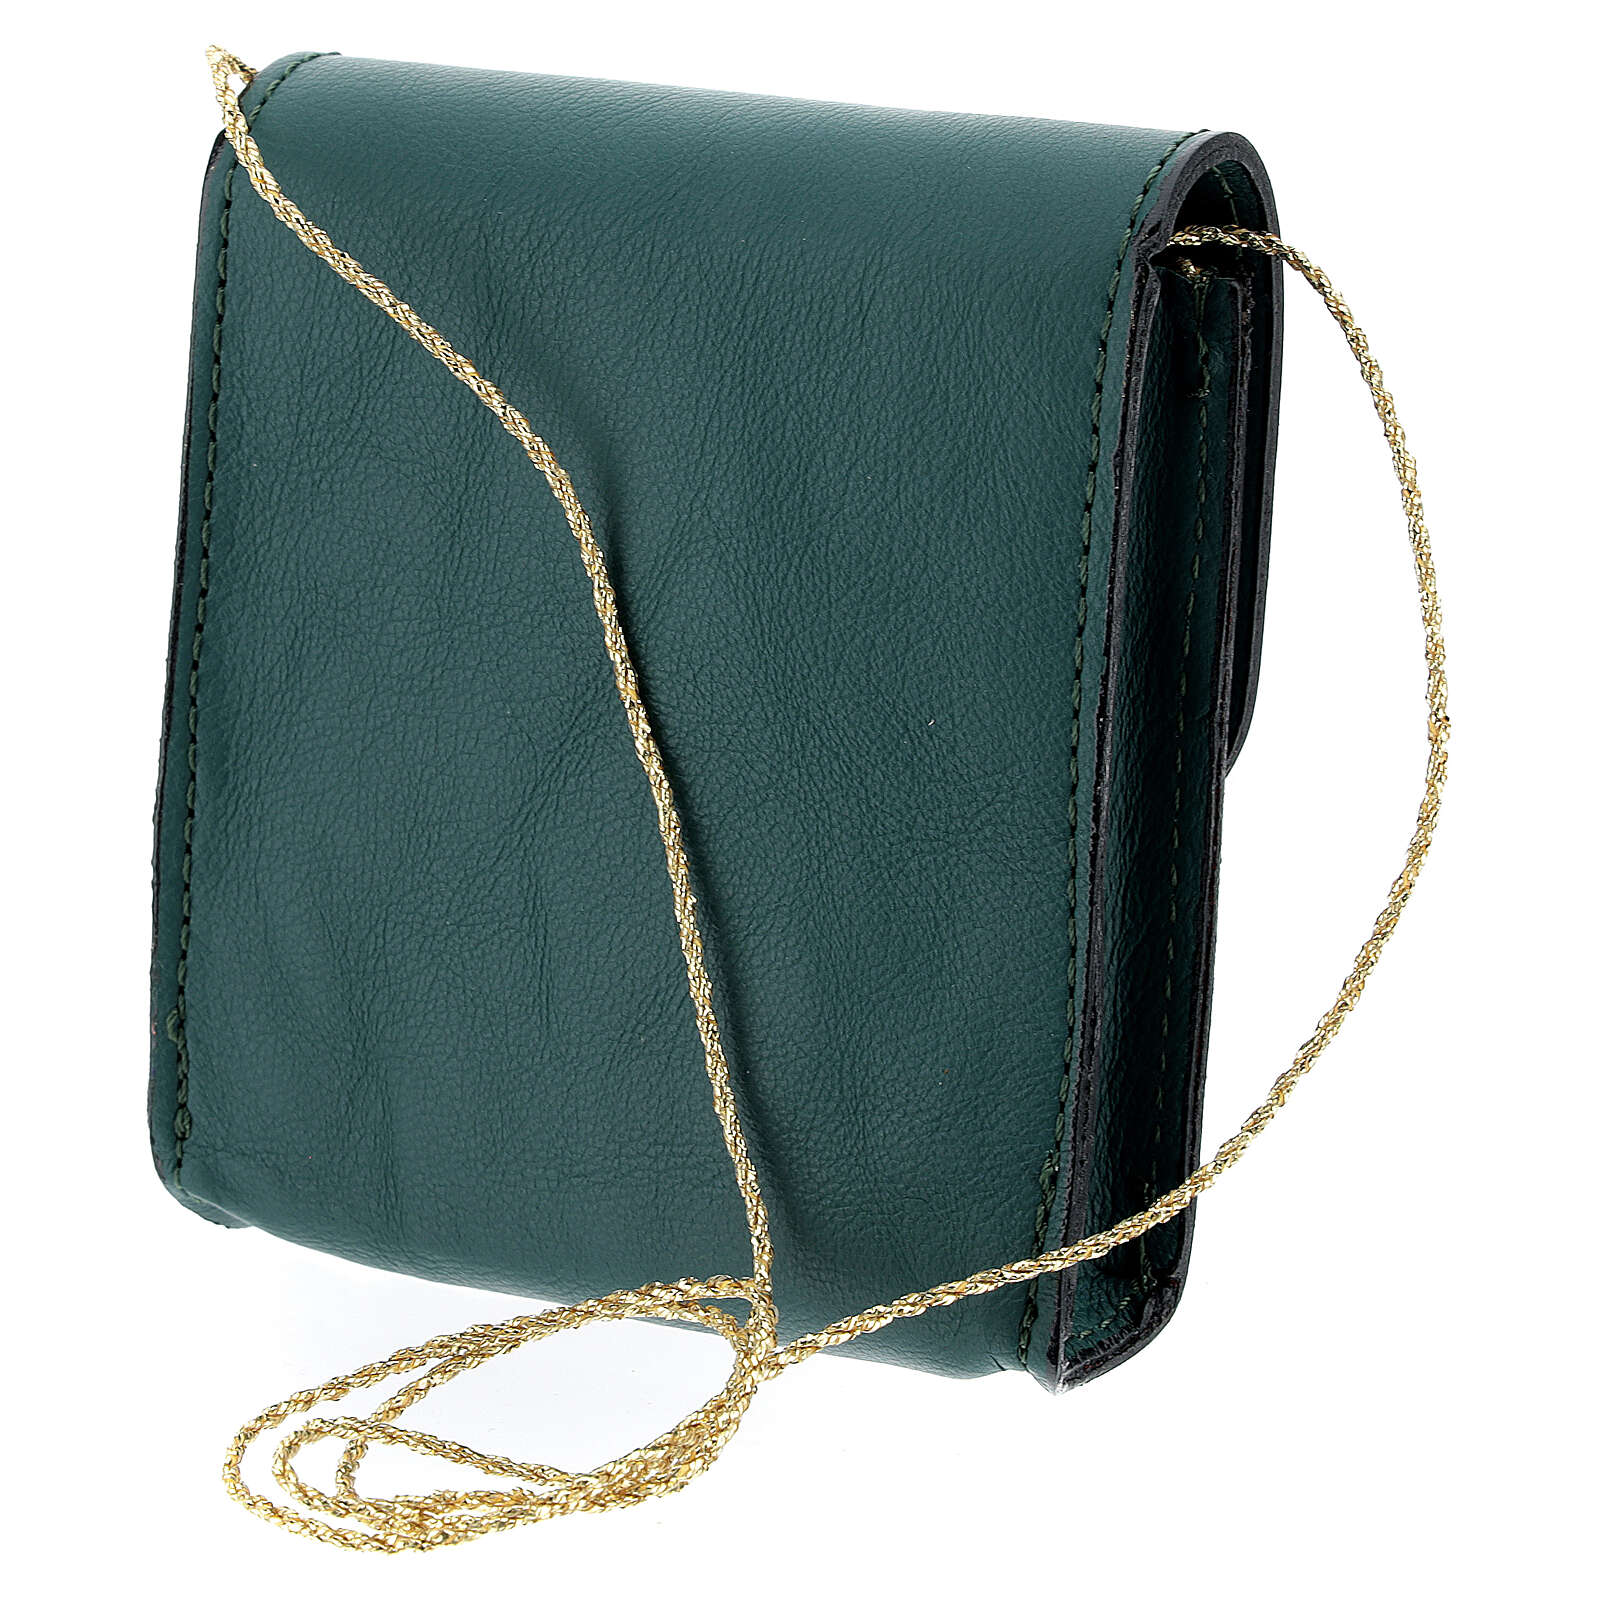 Paten case 9x9 cm in green leather 4